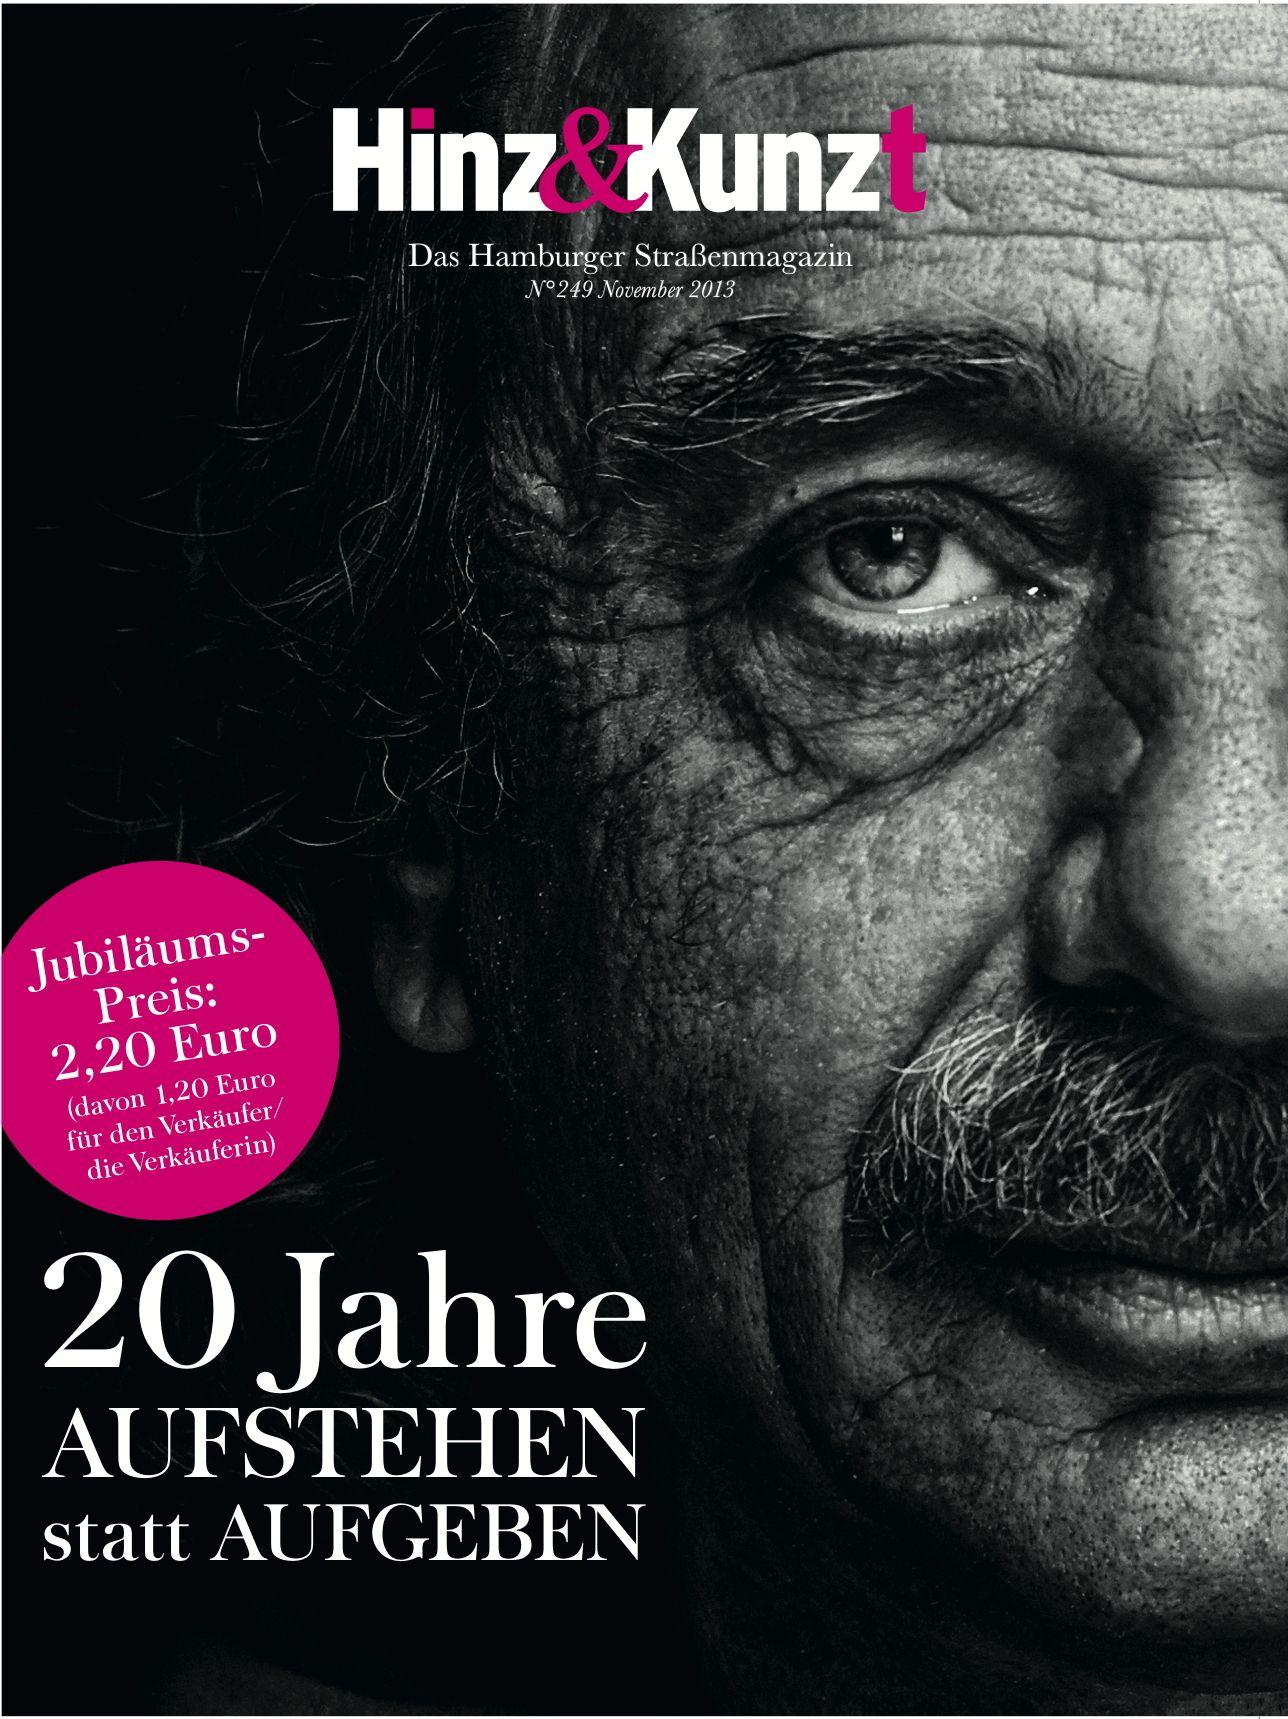 Das Hamburger Stadtmagazin